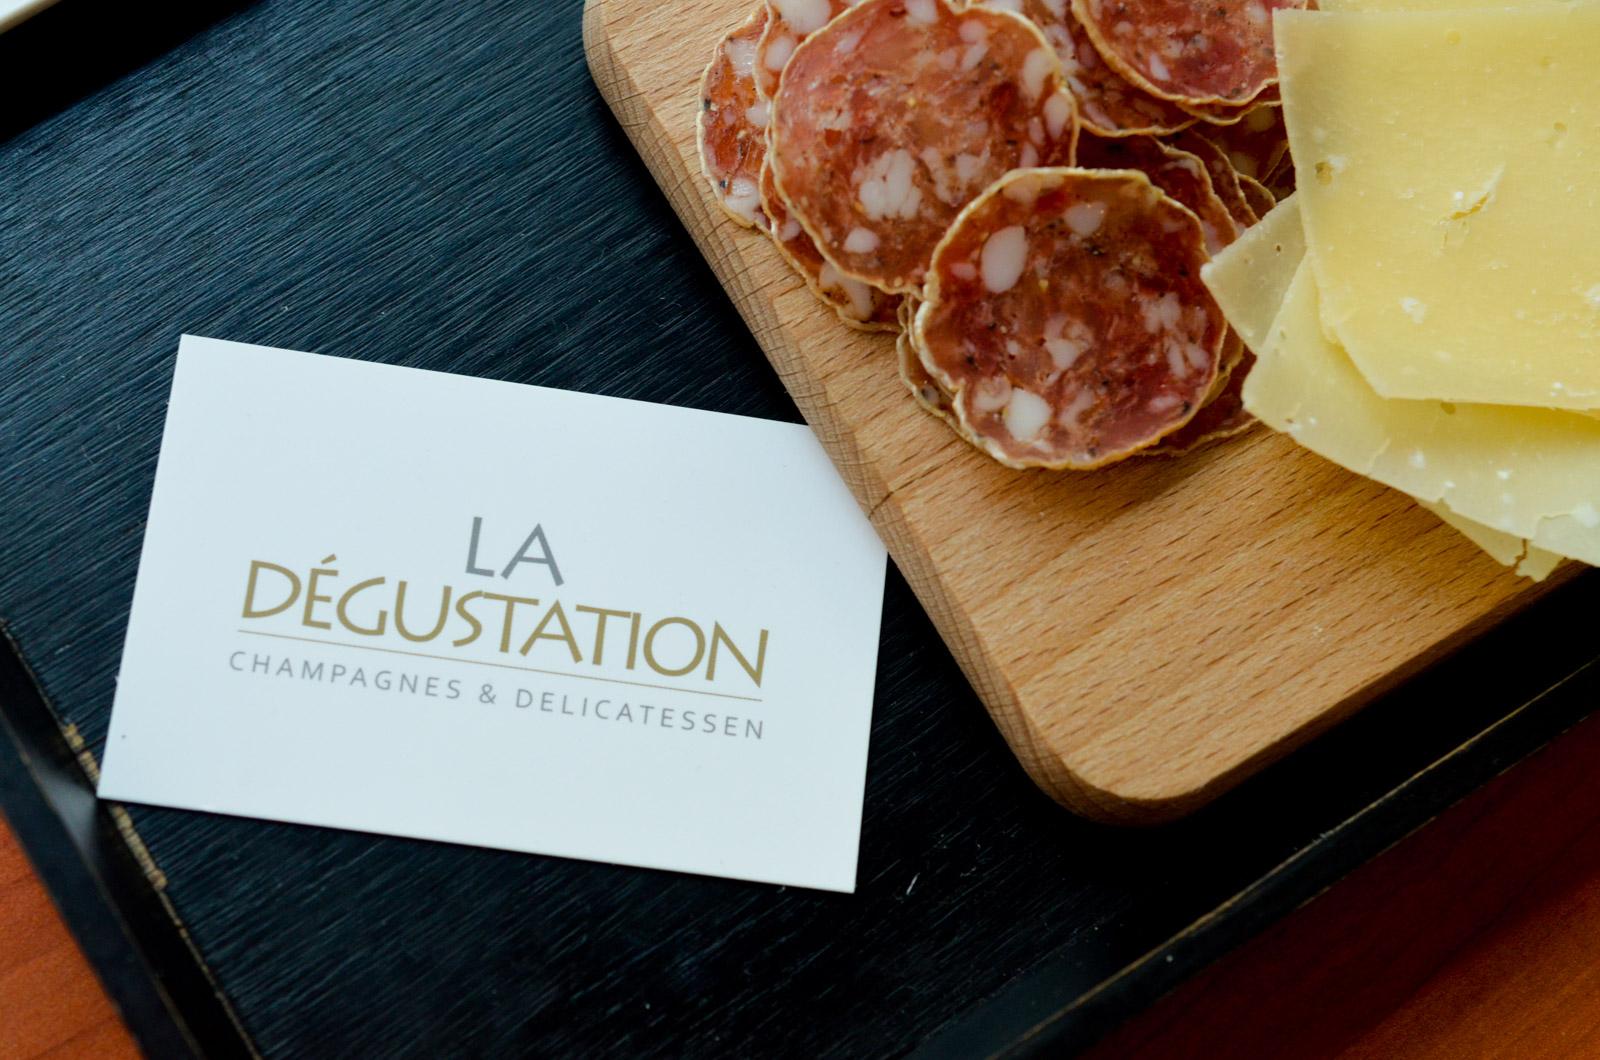 La Degustation Euro2016 Restaurant Champagne 9 Sur 18